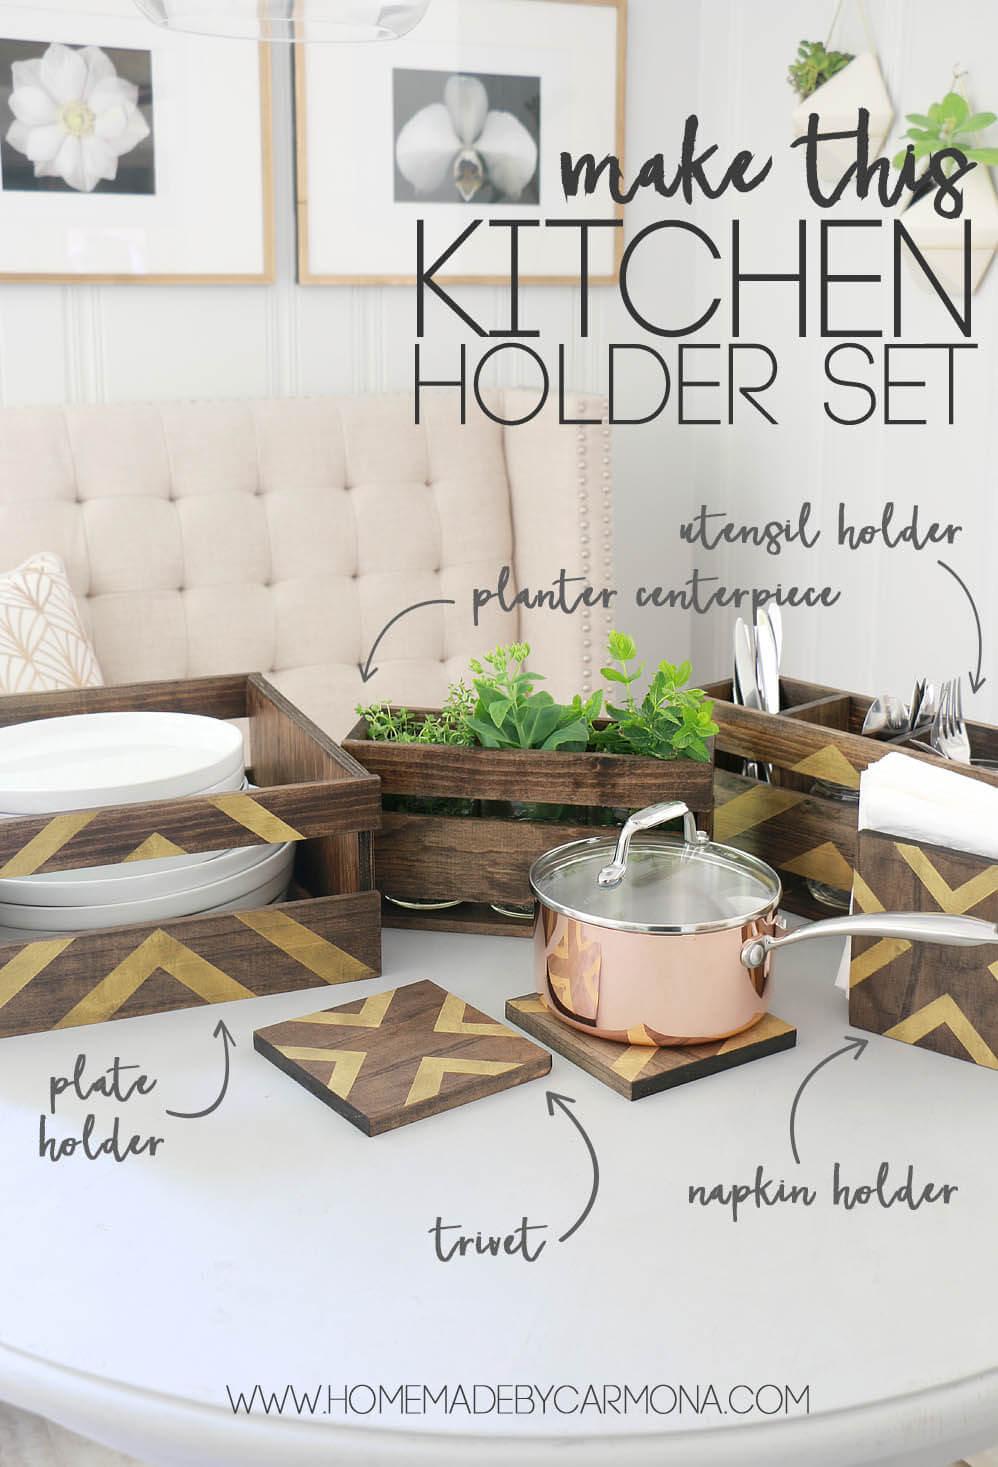 Diy Kitchen Utensil Holder Dish Holder Set Home Made By Carmona